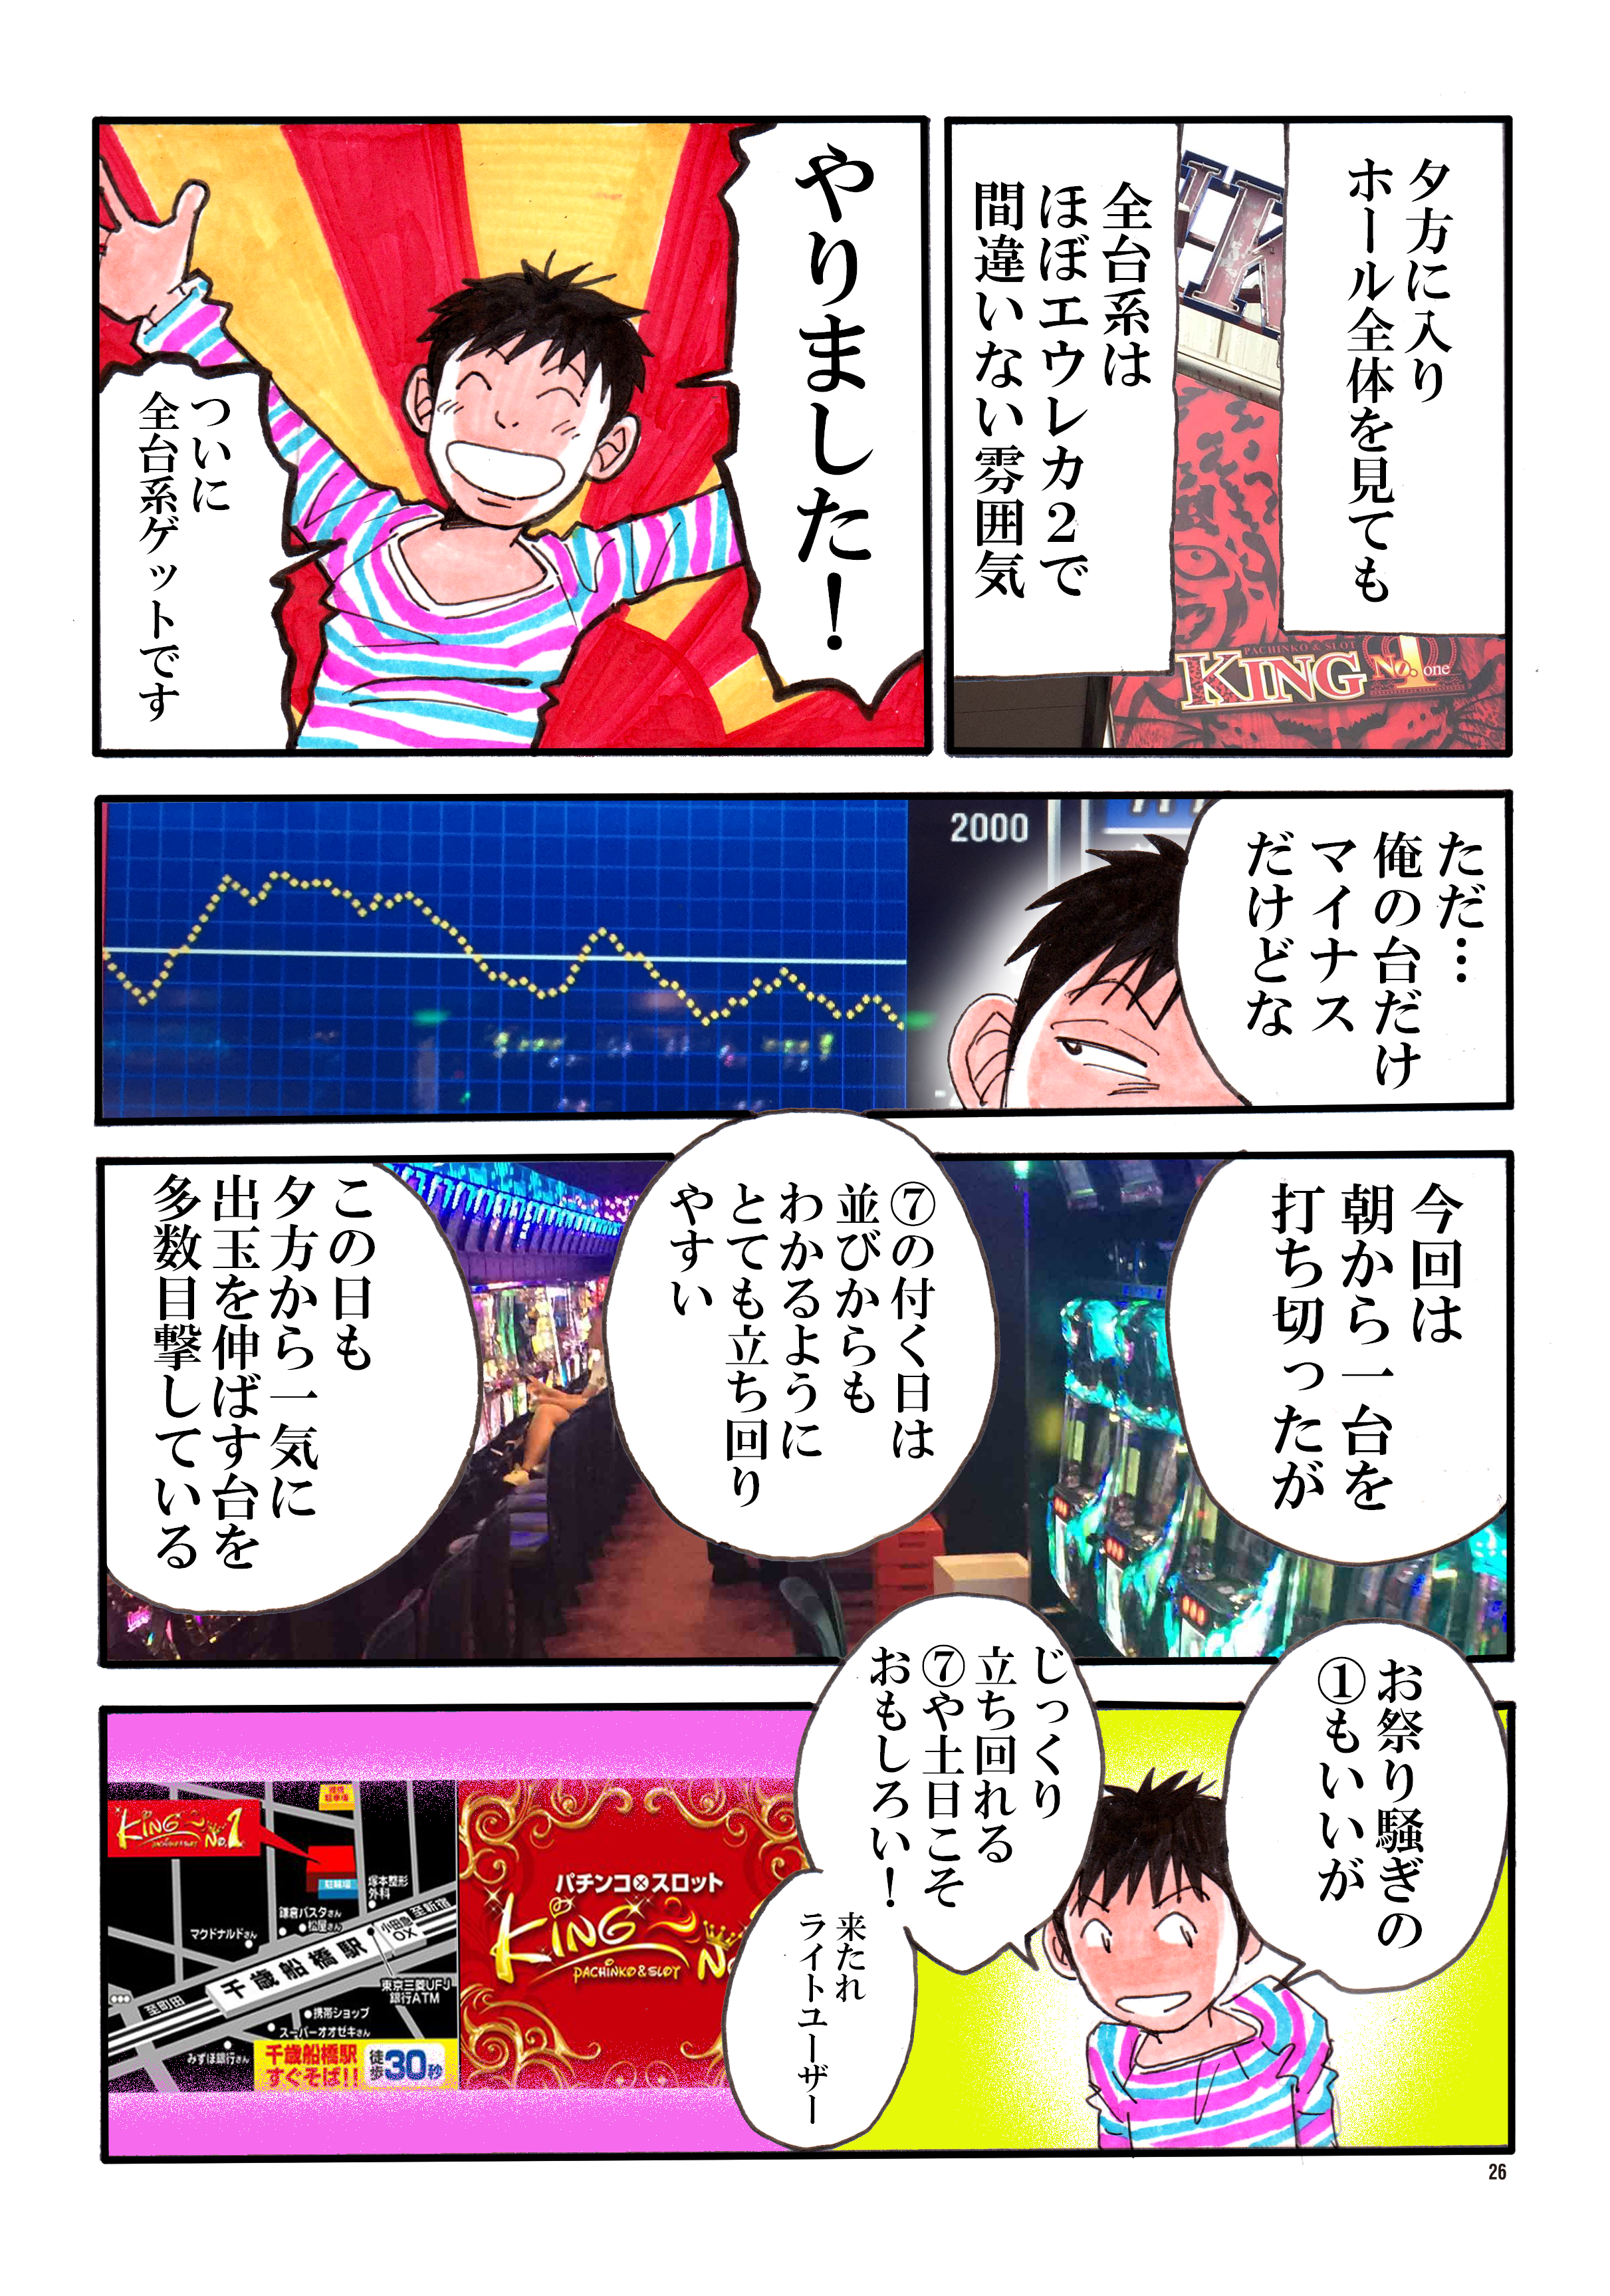 vol.5-6キング大解析